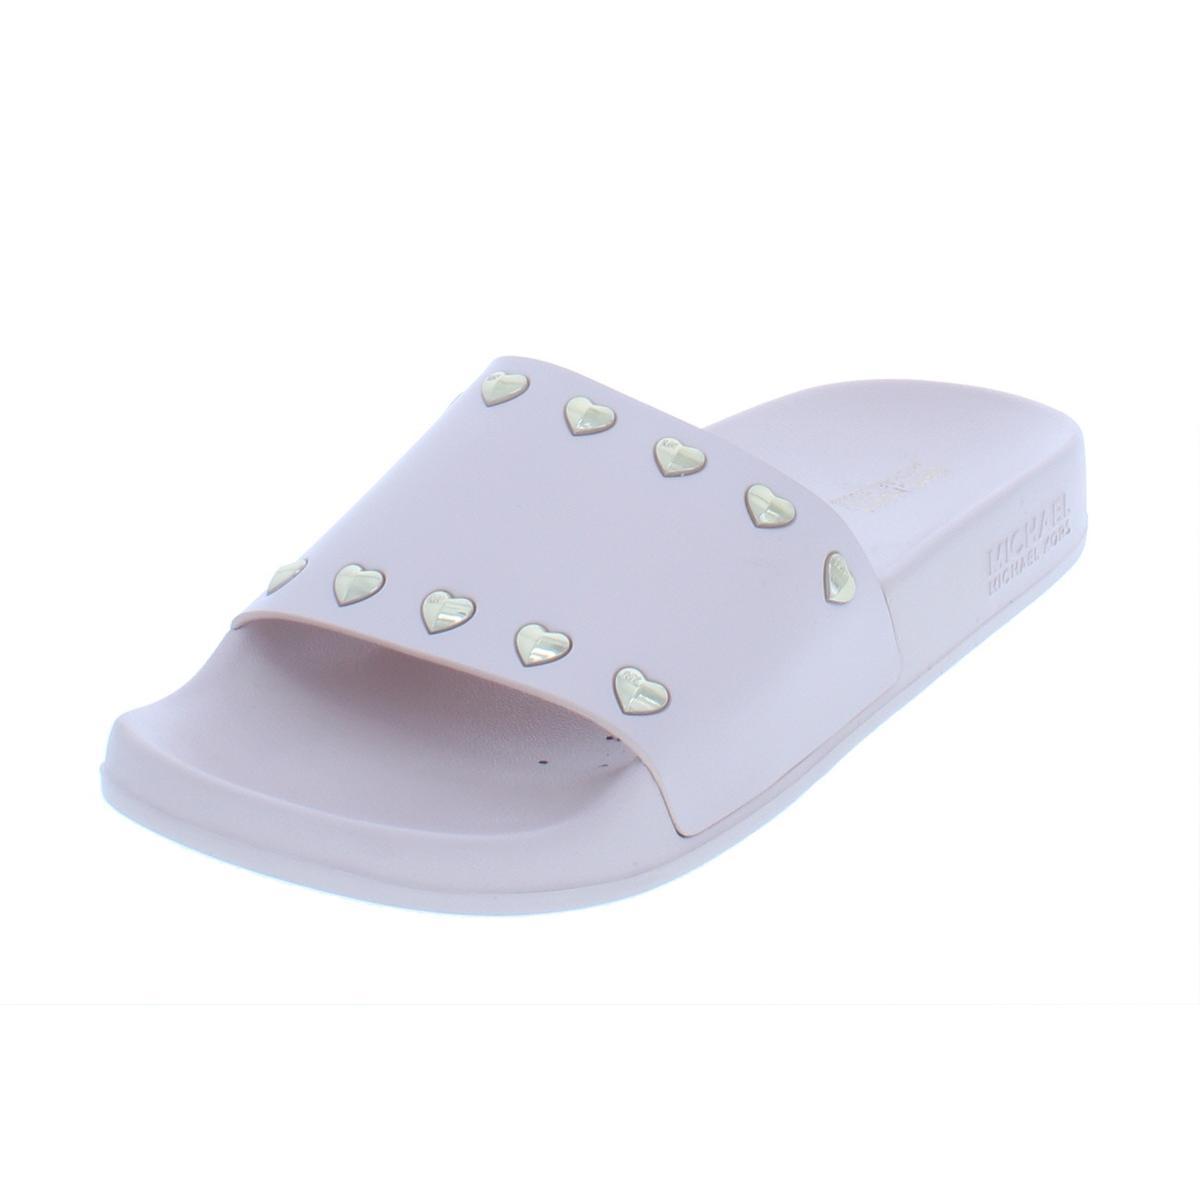 e48279ee8b90 Details about MICHAEL Michael Kors Womens Zooey Open Toe Studded Slide  Sandals Shoes BHFO 5841